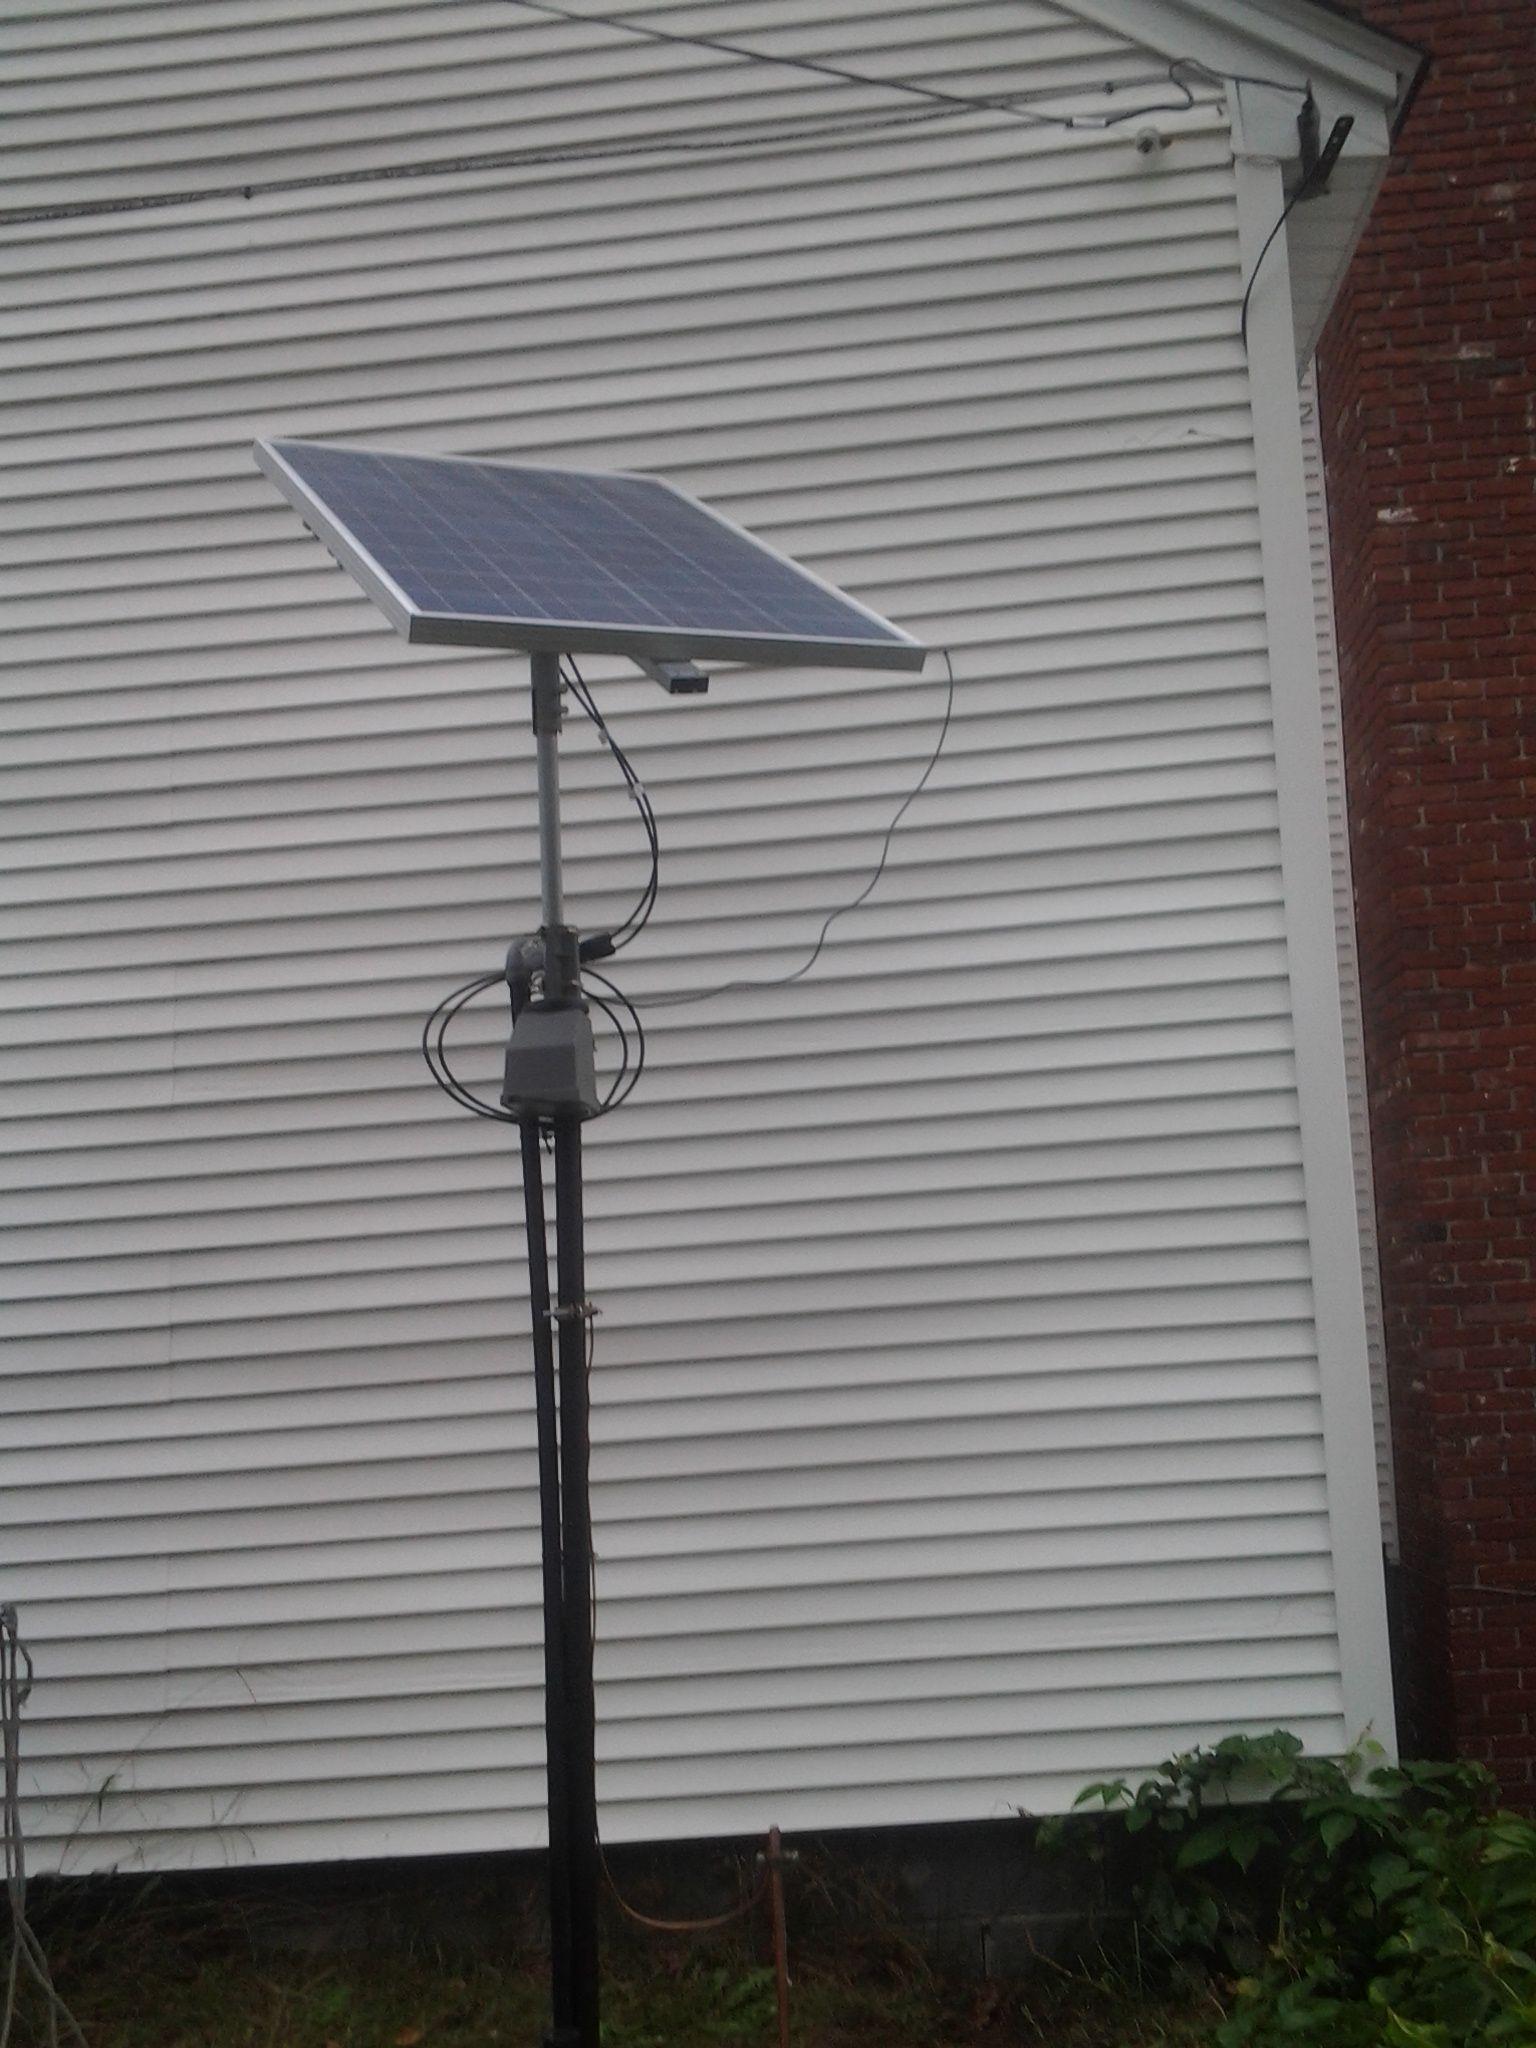 Solar Powered Hoop Style Greenhouse Bathroom Lighting Fixture Electrical Issues Doityourselfcom Step 7